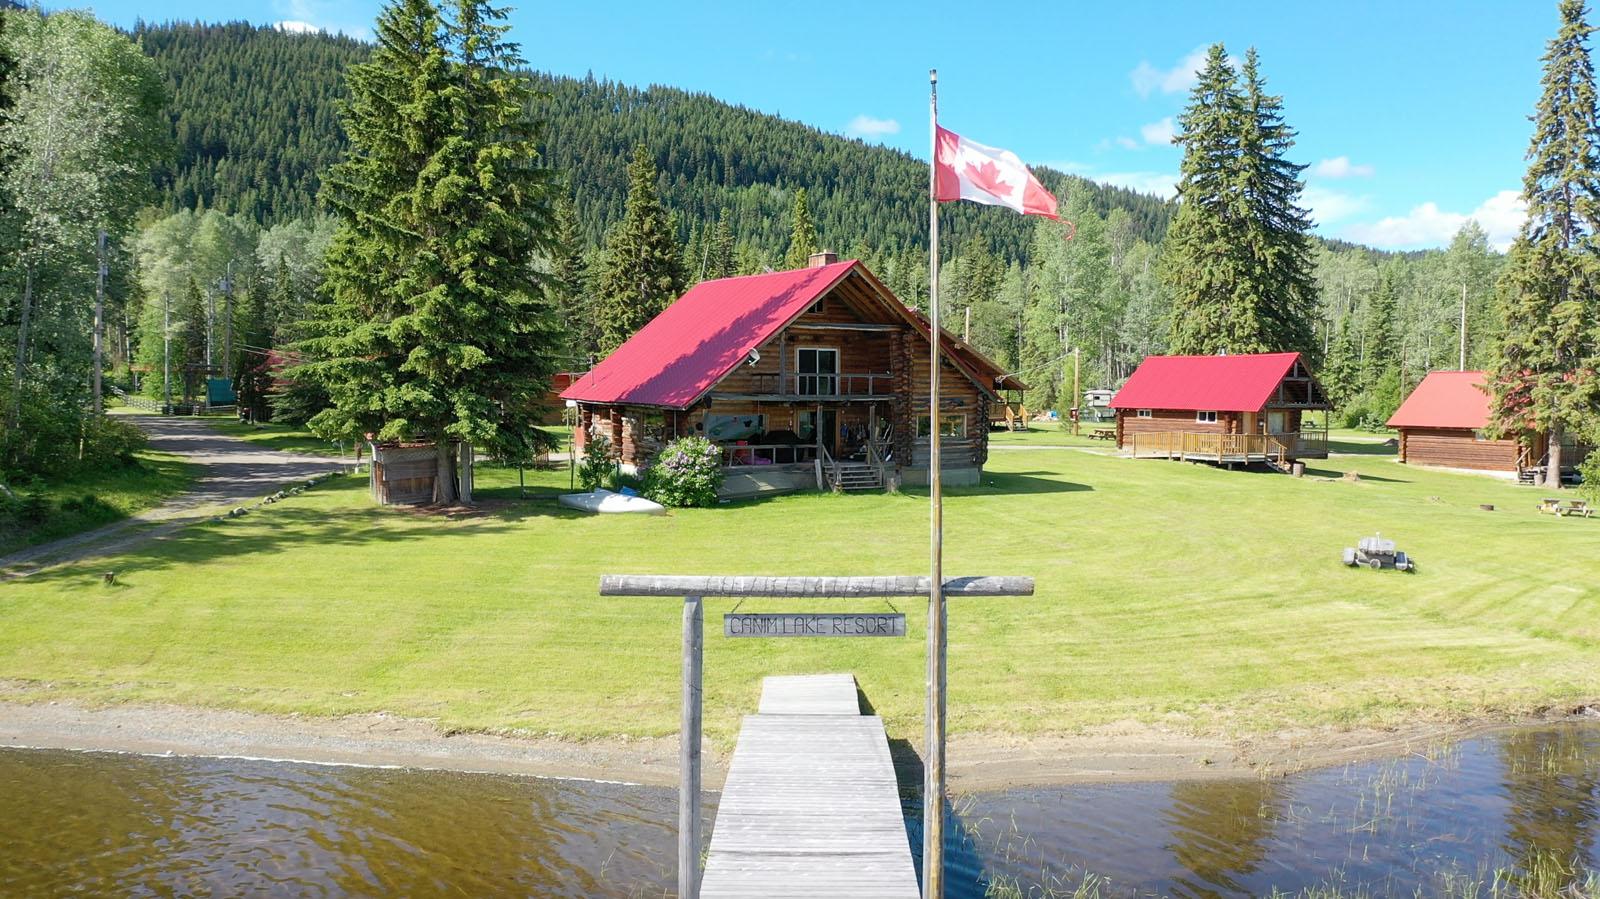 Canim lake resort 19